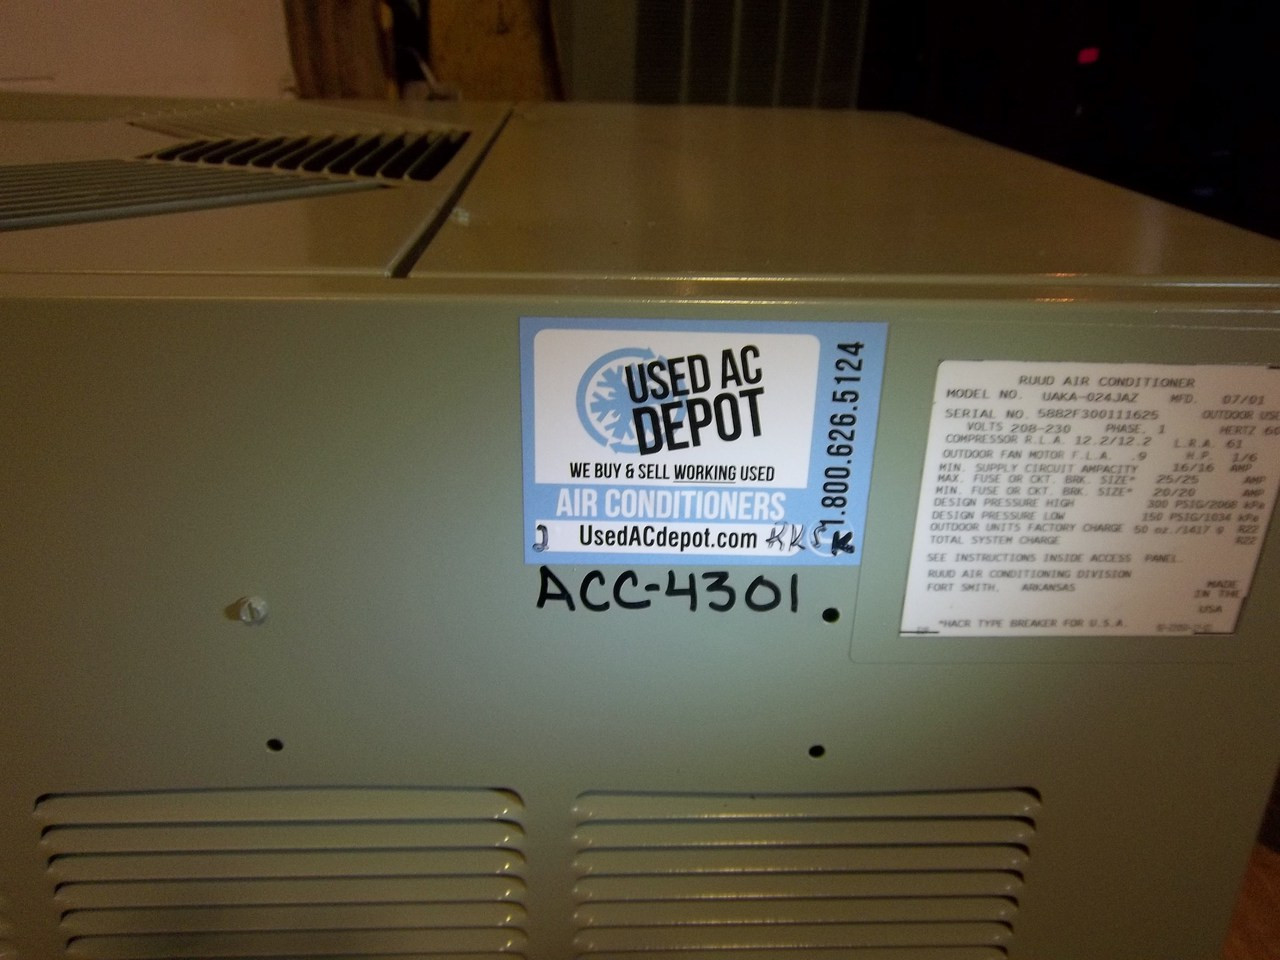 used ac depot refurbished certified condenser ruud uaka 024jaz 1m rh usedacdepot com